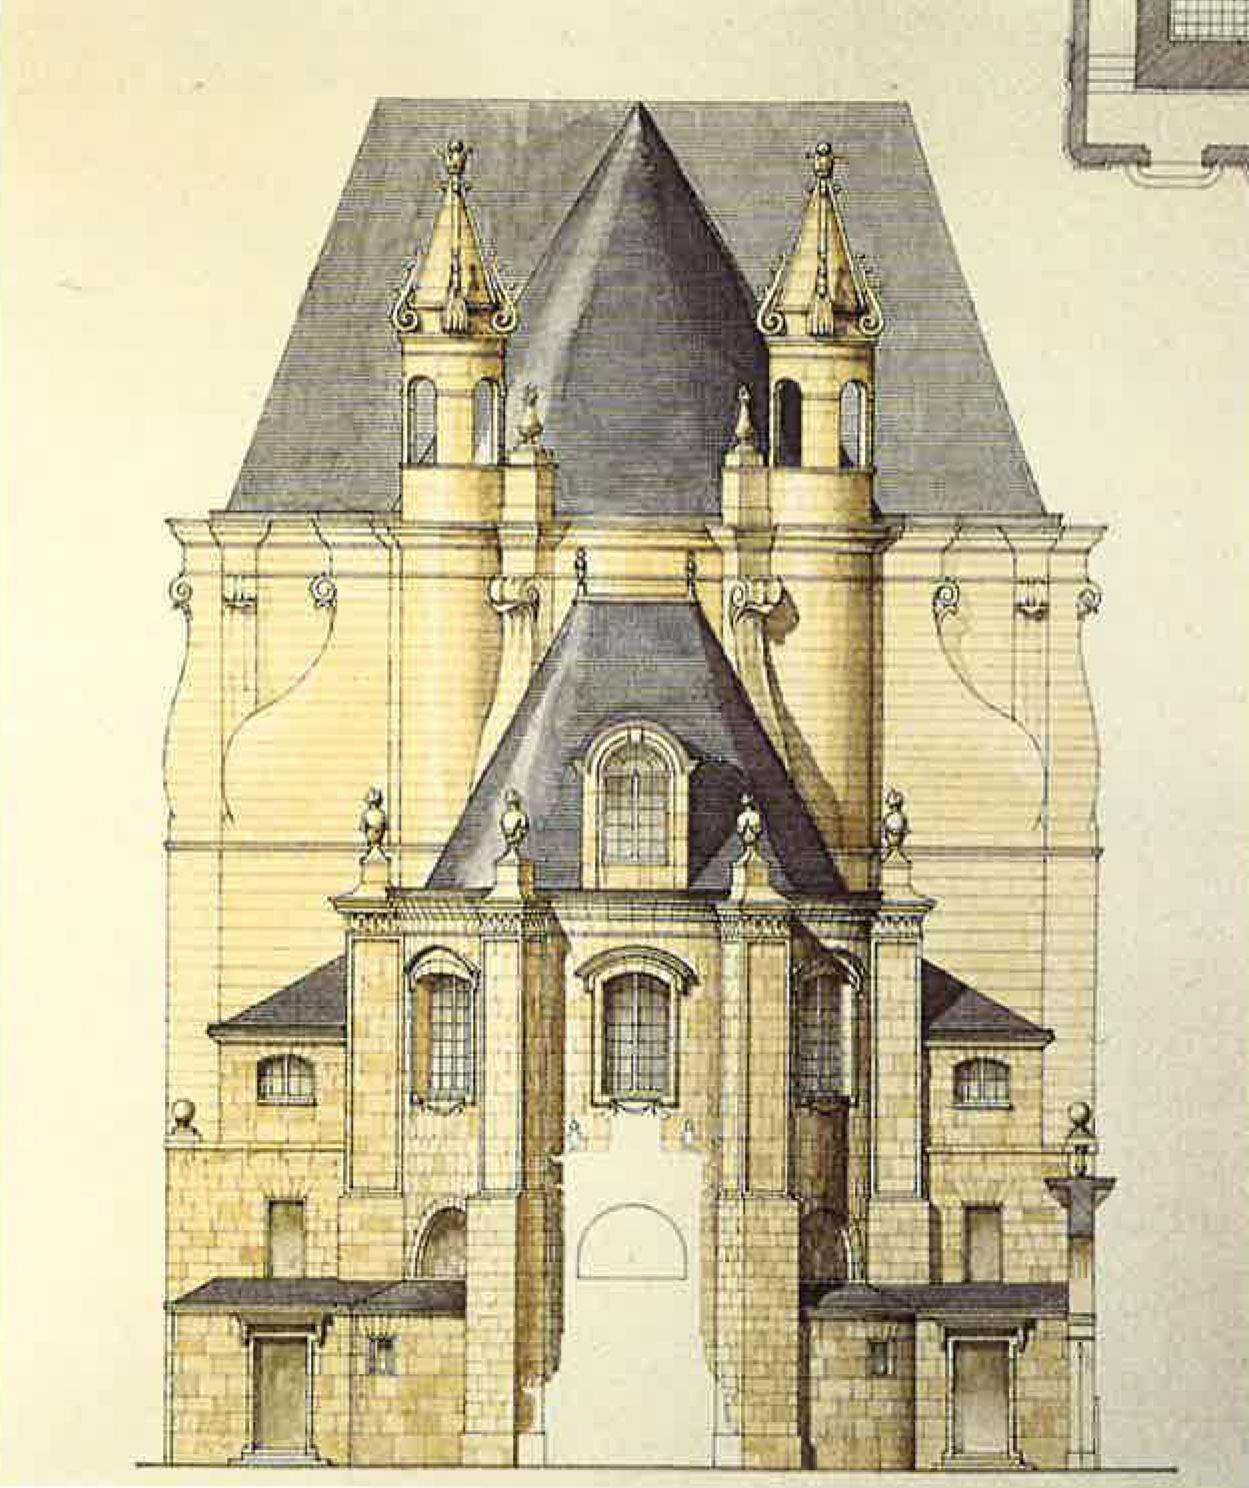 Botton la compagnie des architectes en chef des for Architecte en chef des monuments historiques